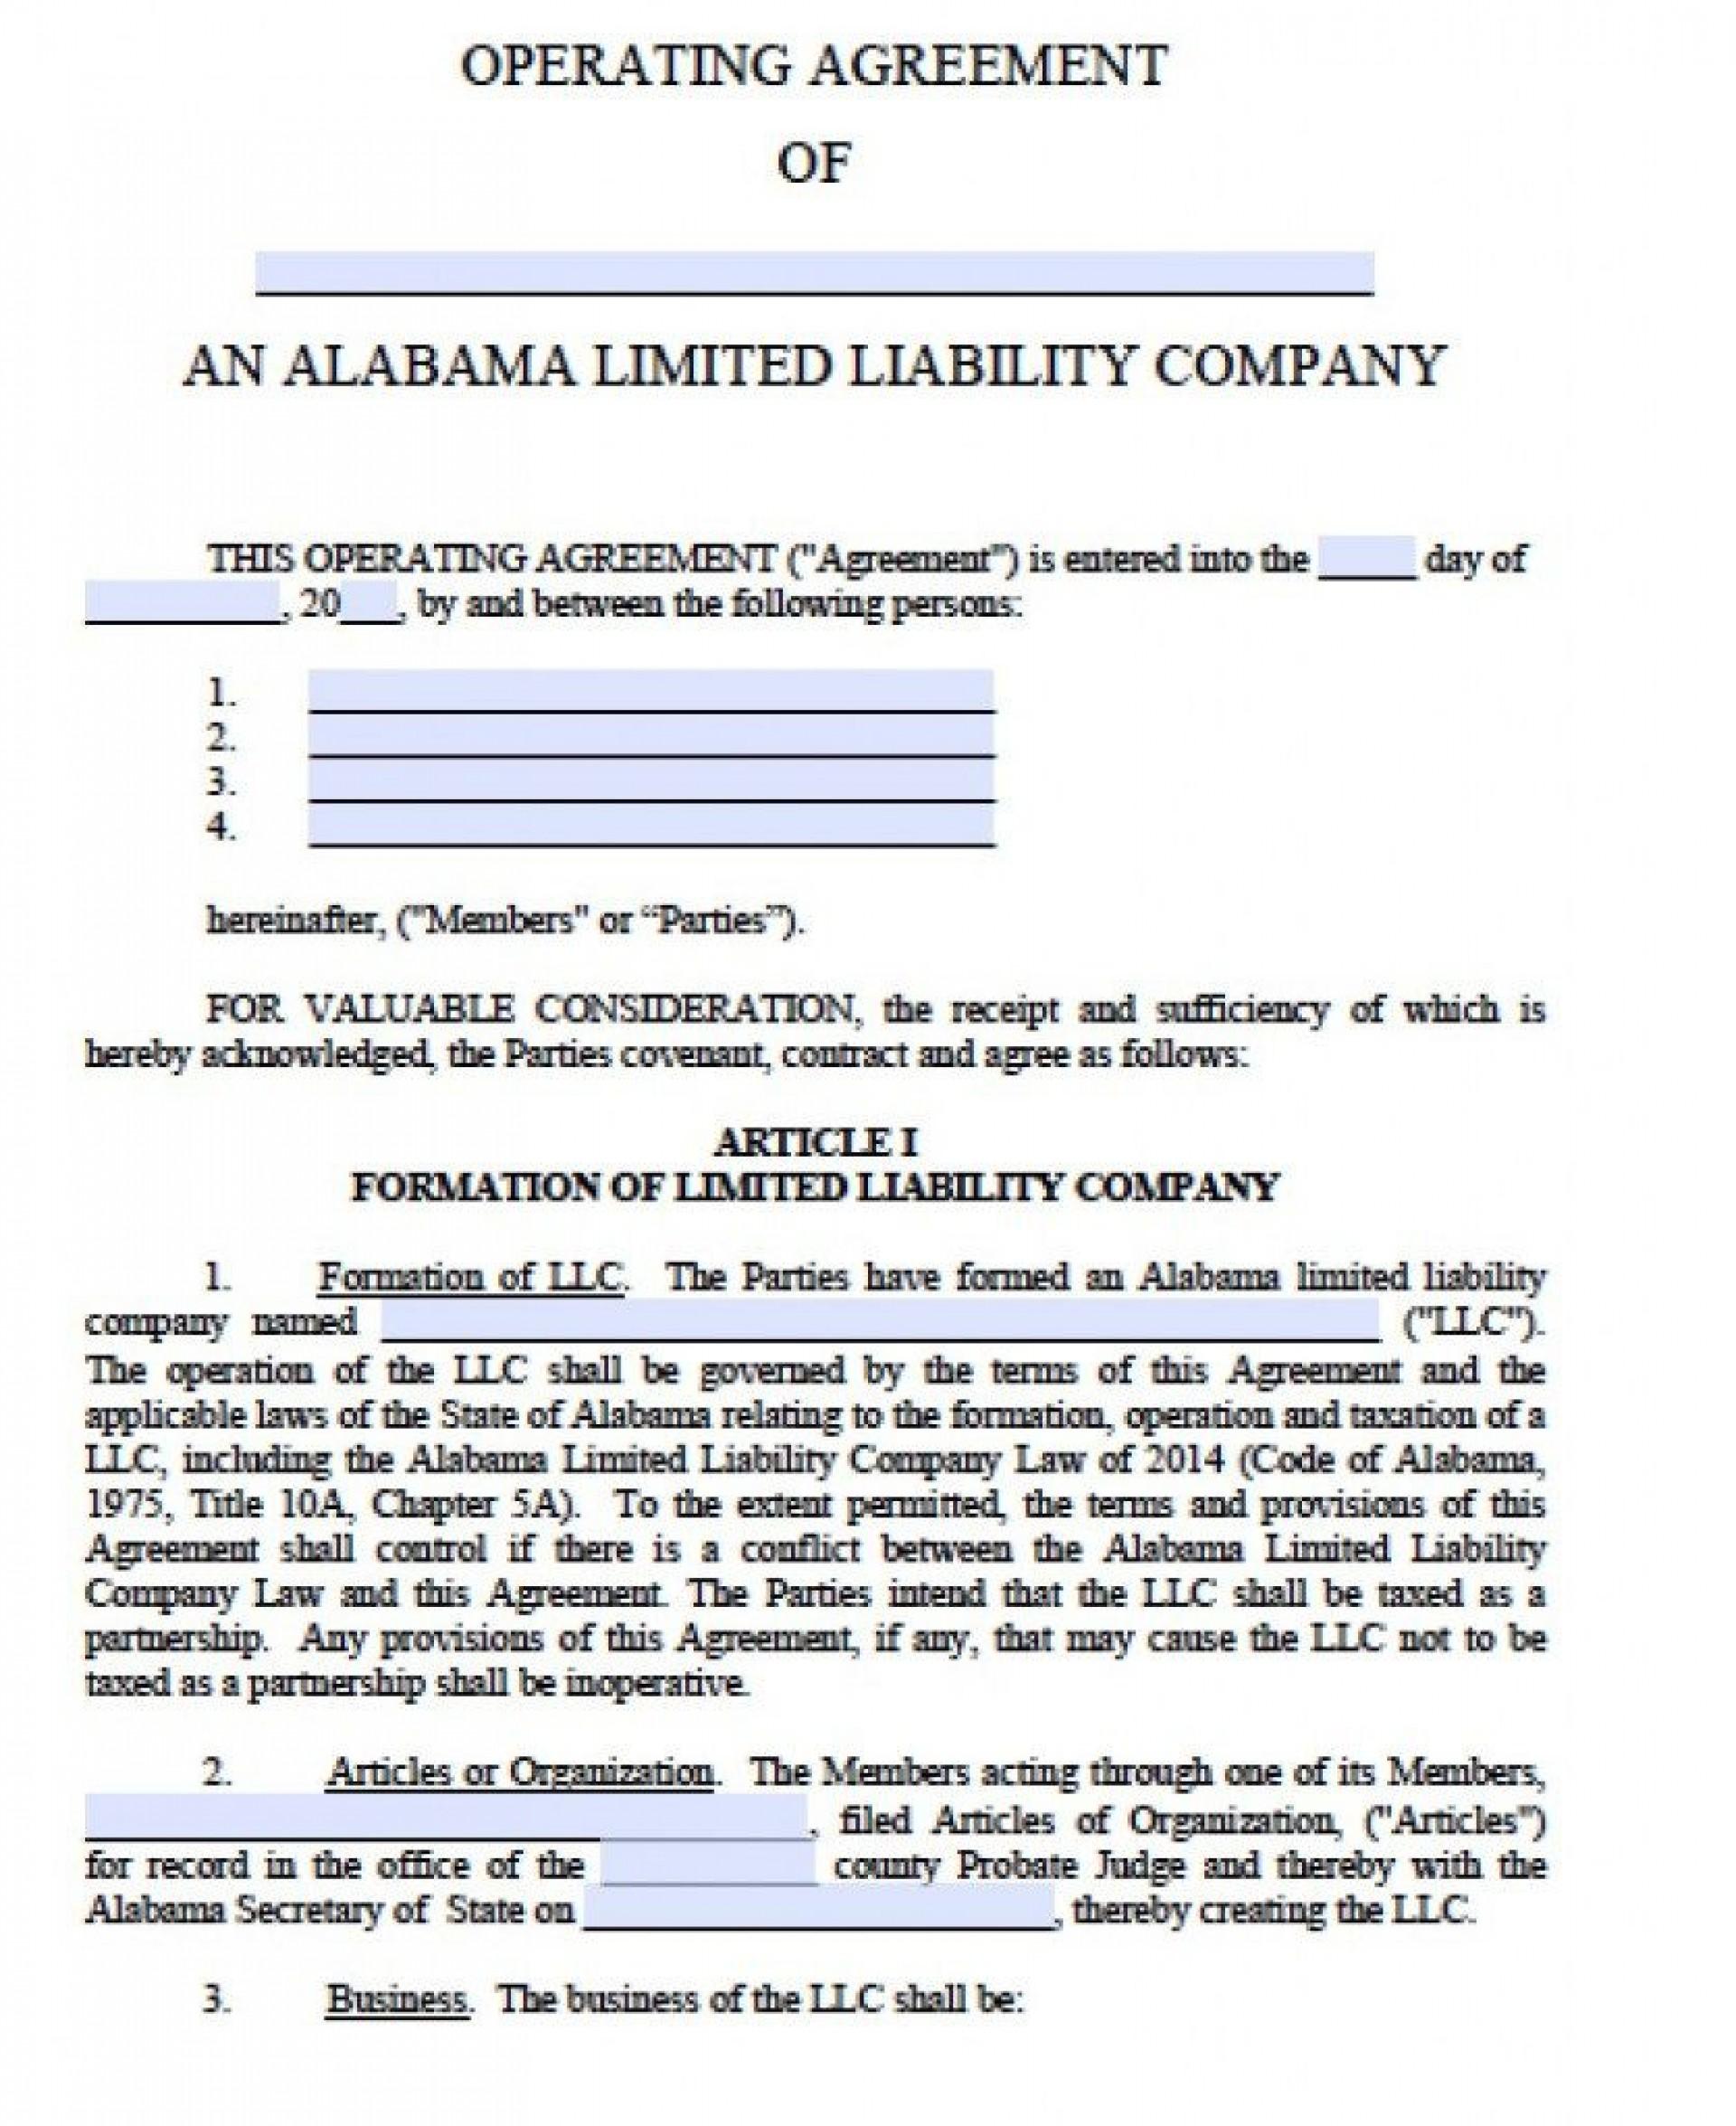 001 Unique Operation Agreement Llc Template Sample  Operating Florida Indiana Single Member California1920